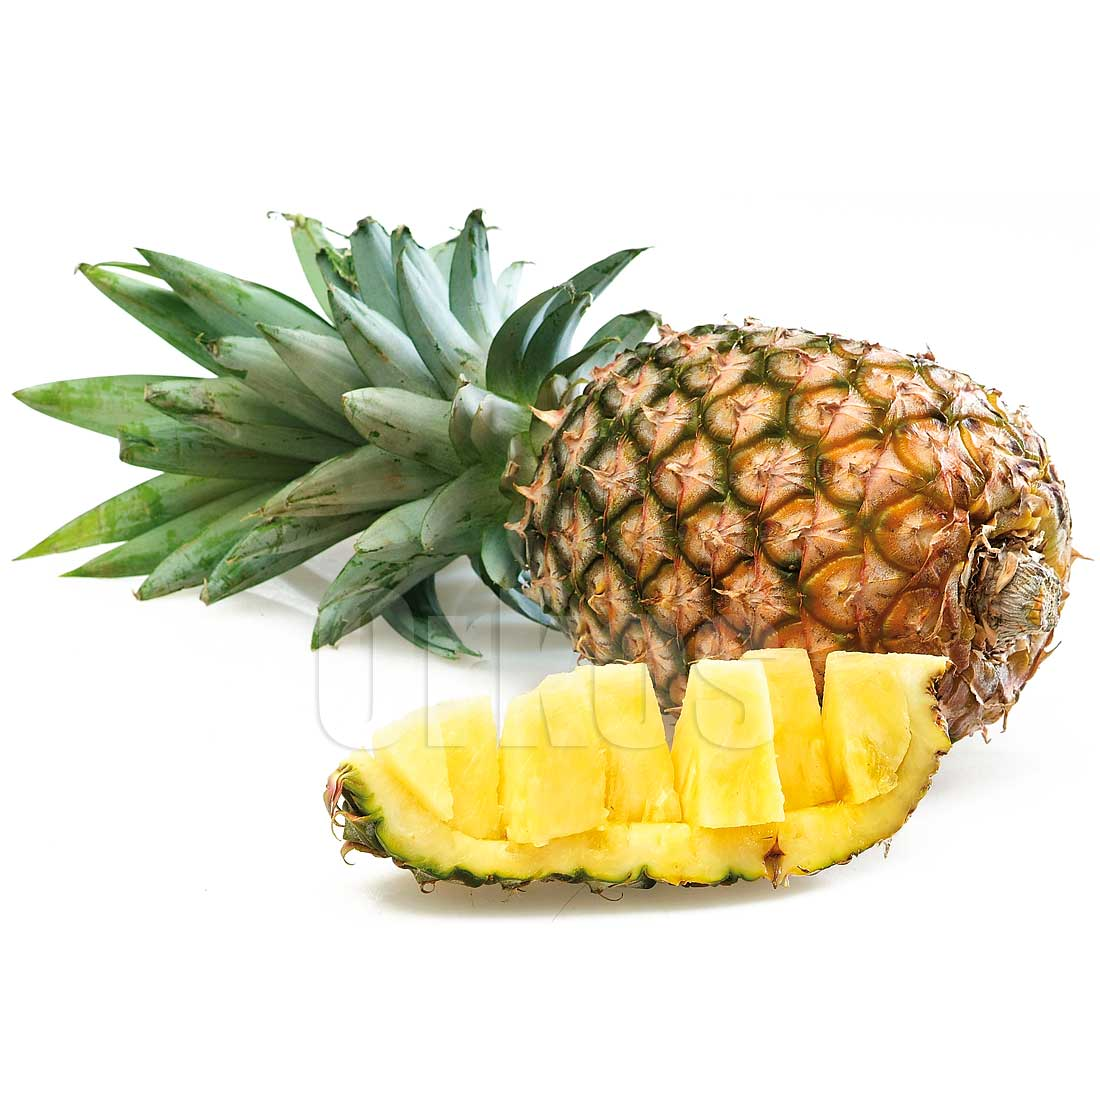 Better to be honest teknologi pembuatan nenas bagi pemenuhan gizi masyarakat buah nenas memiliki arti penting diantara jenis buah buahan lain buah nenas mengandung gizi yang cukup lengkap tabel 1 ccuart Images